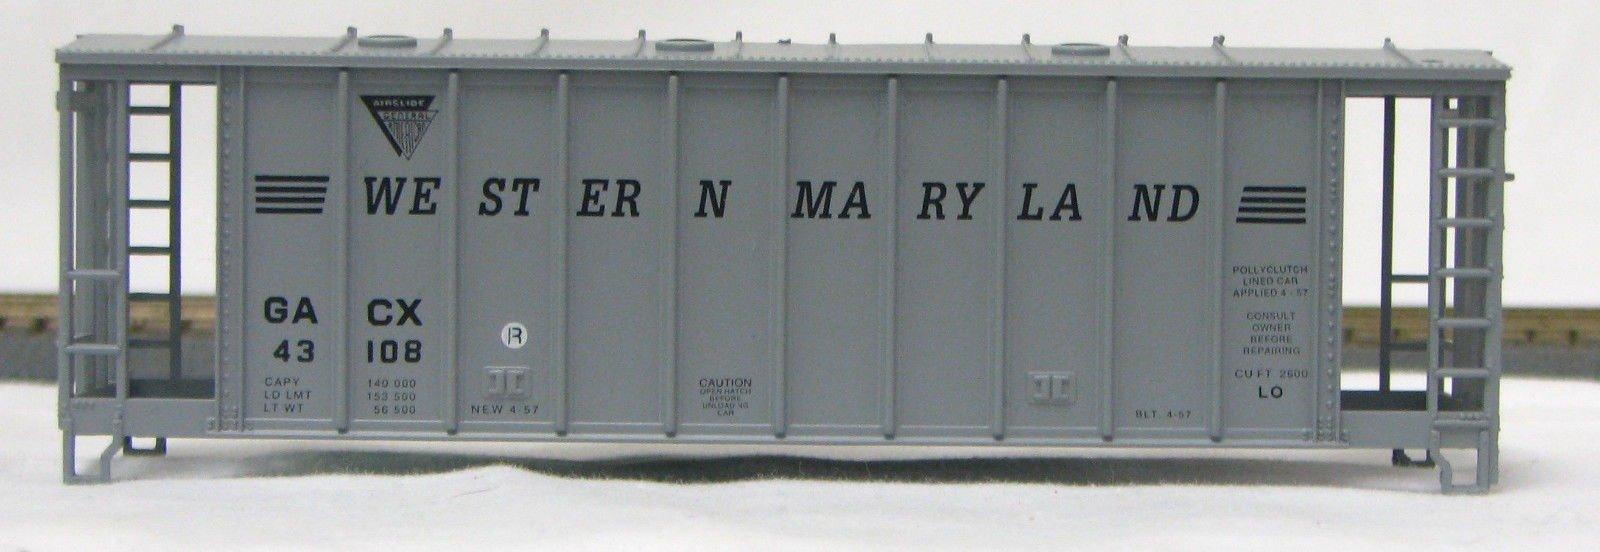 HO 2600 Cu Ft Airslide Covered Hopper (Kit) Western Maryland (01-9719)